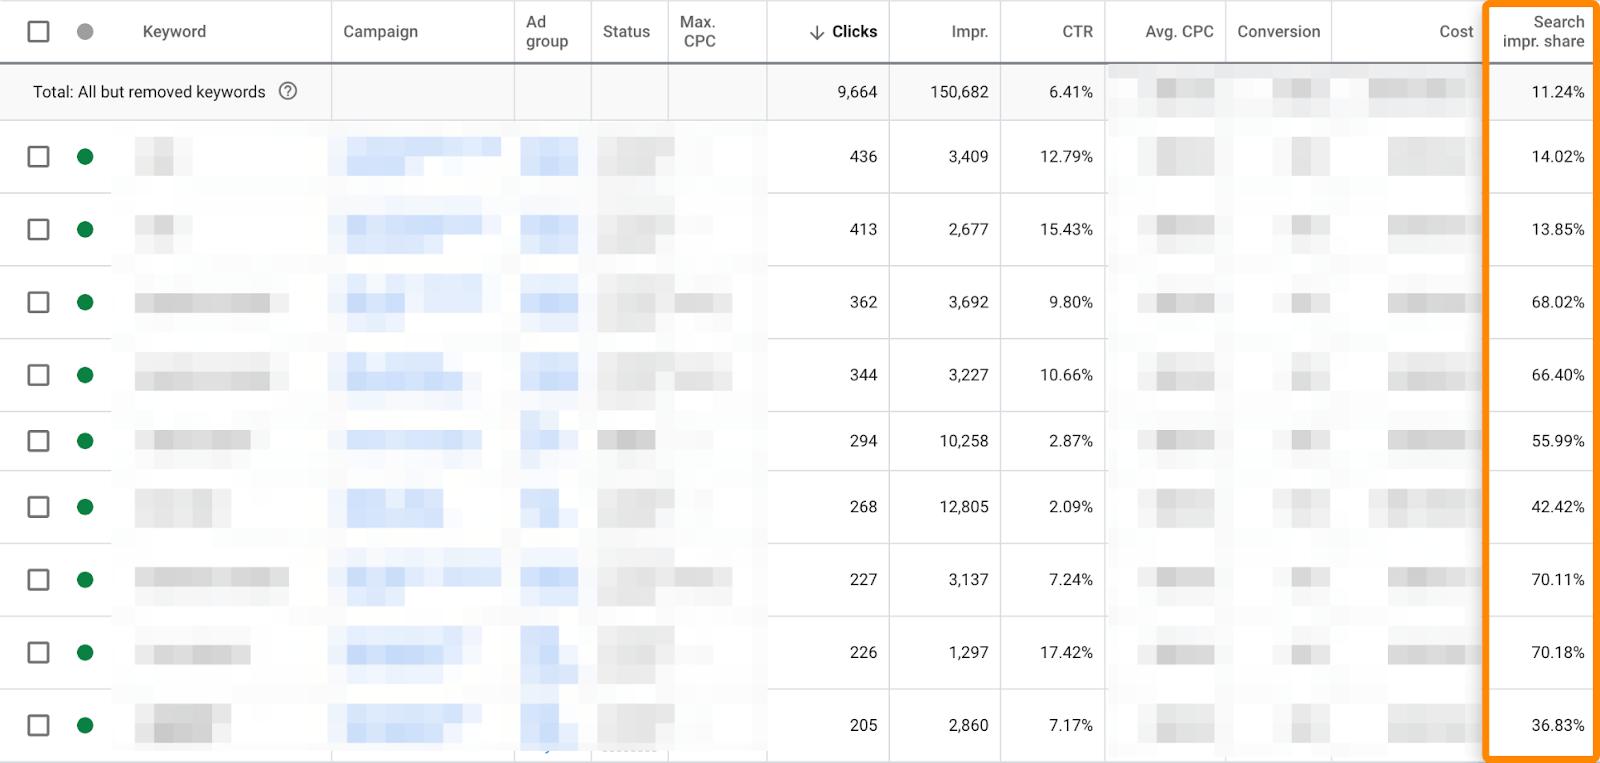 10 google ads search impression share